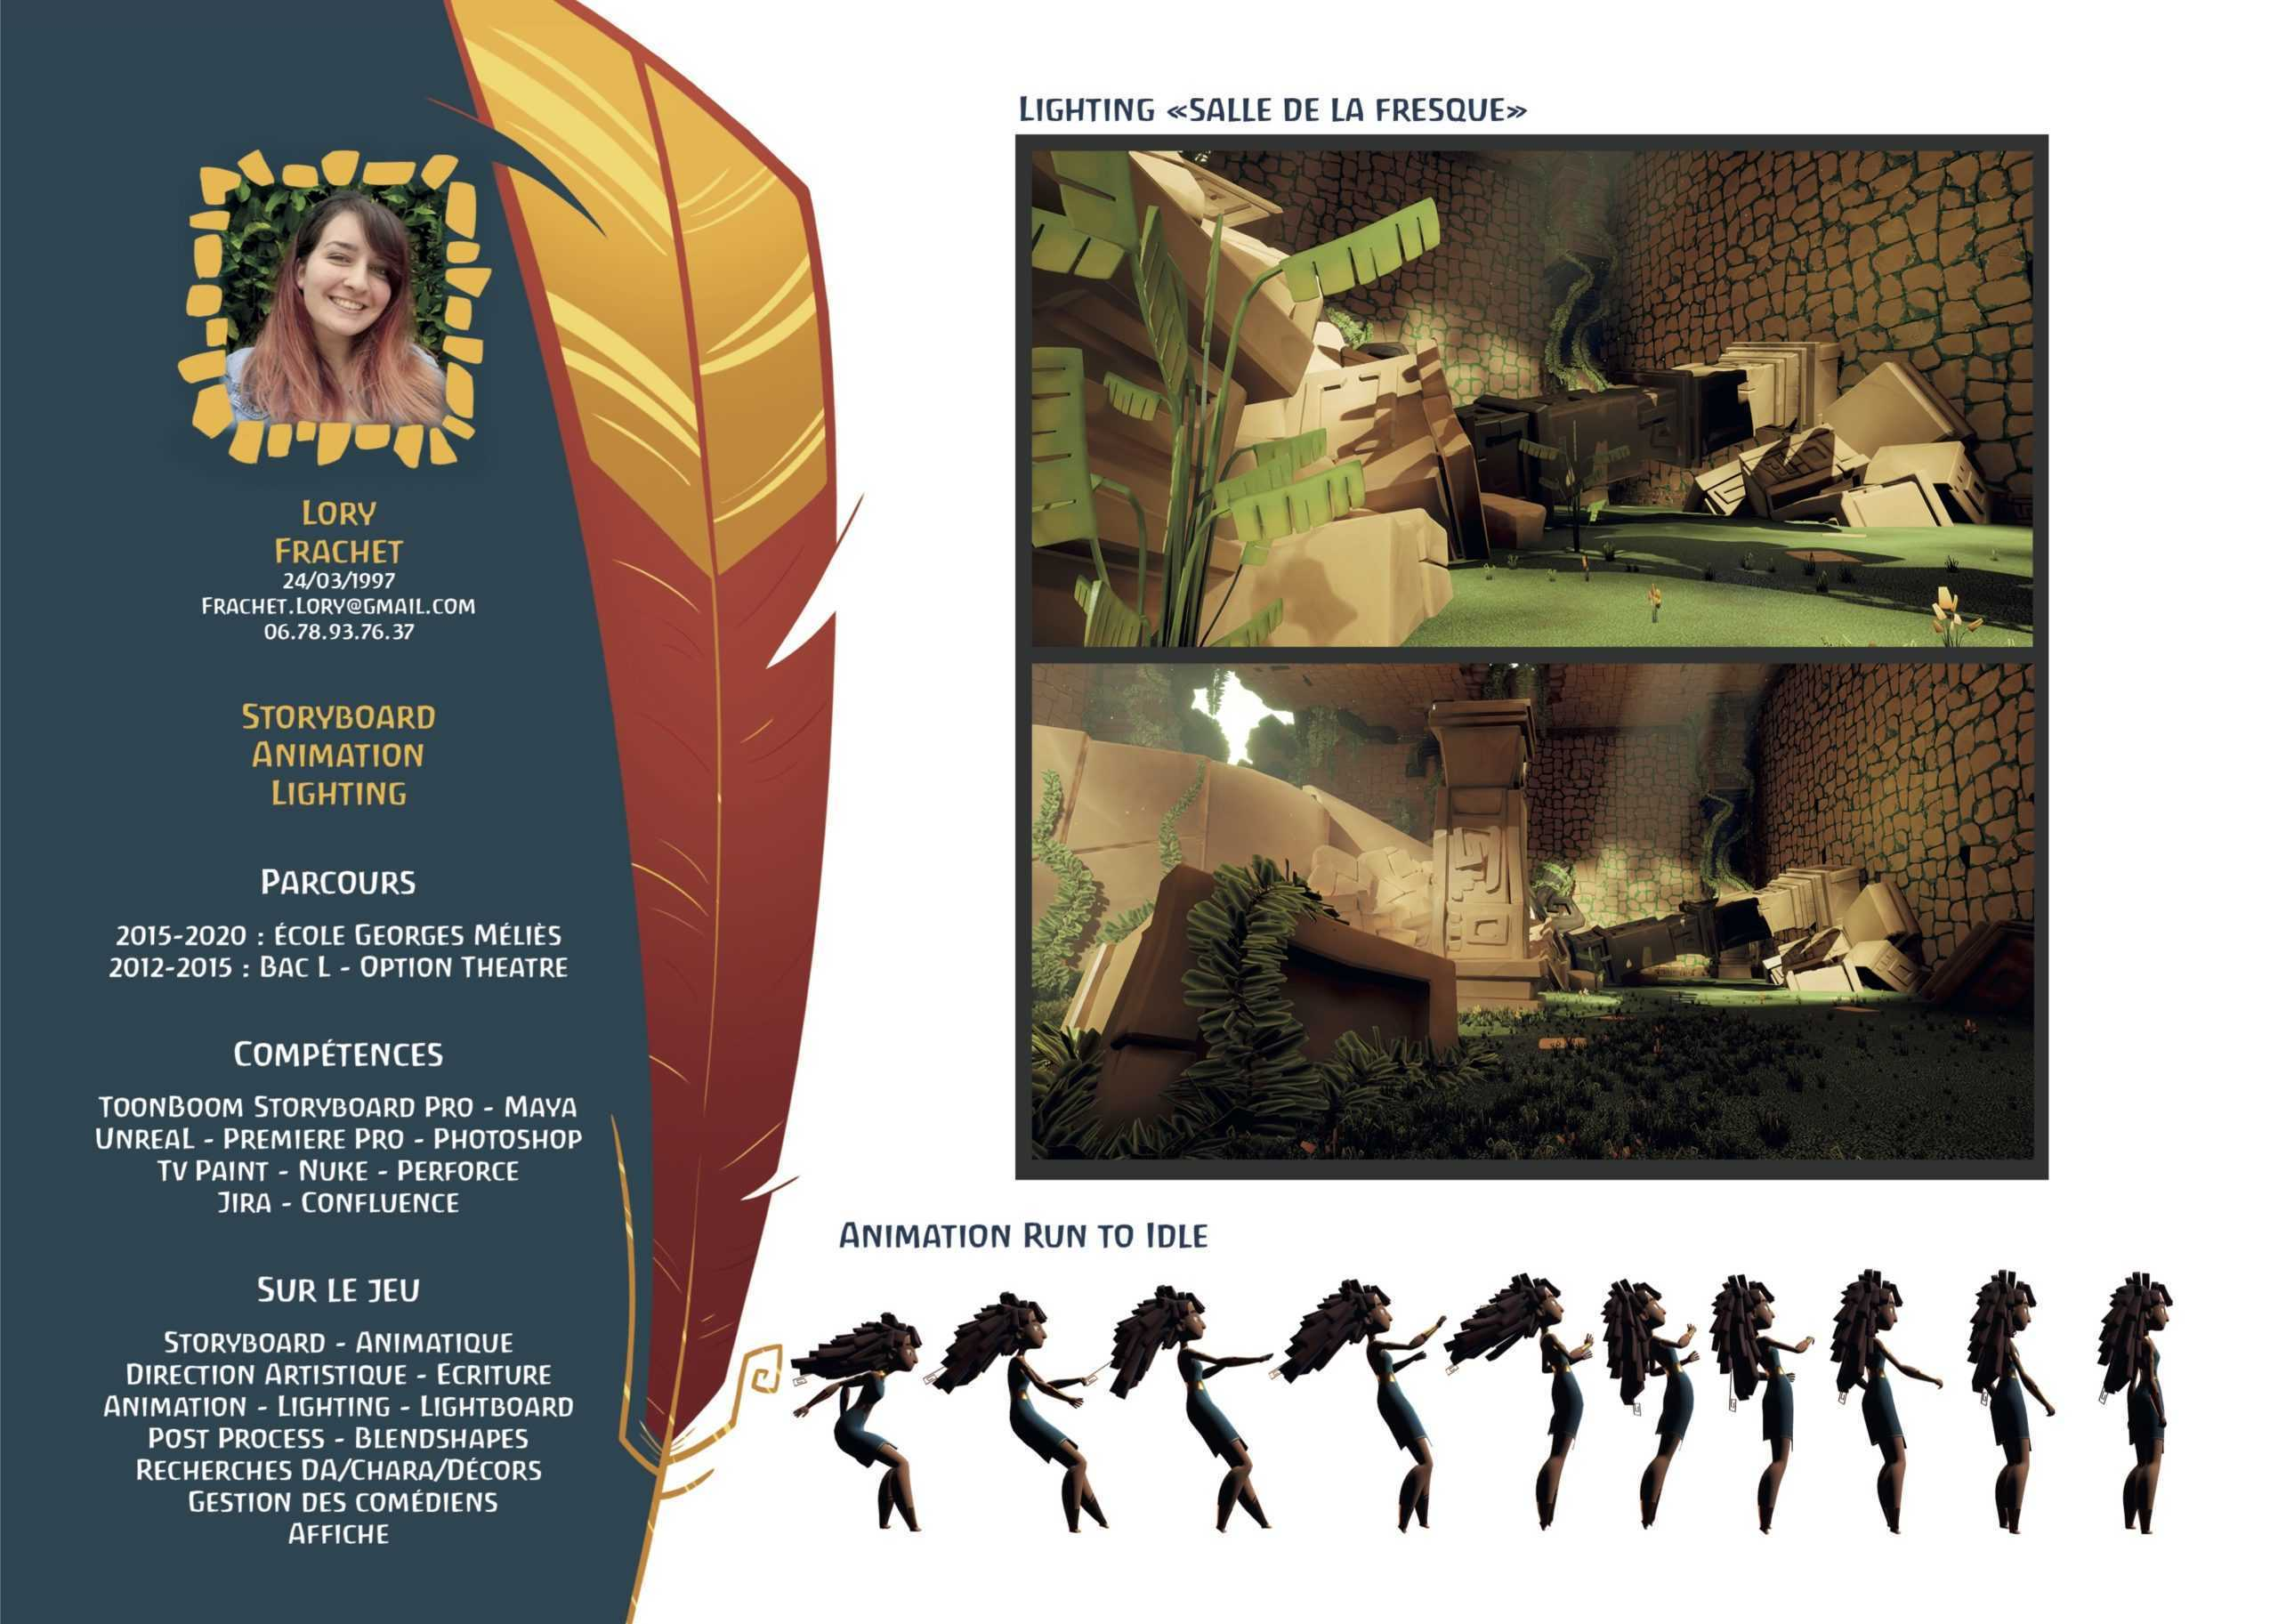 meika-artbook-lory-frachet-1-scaled.jpg